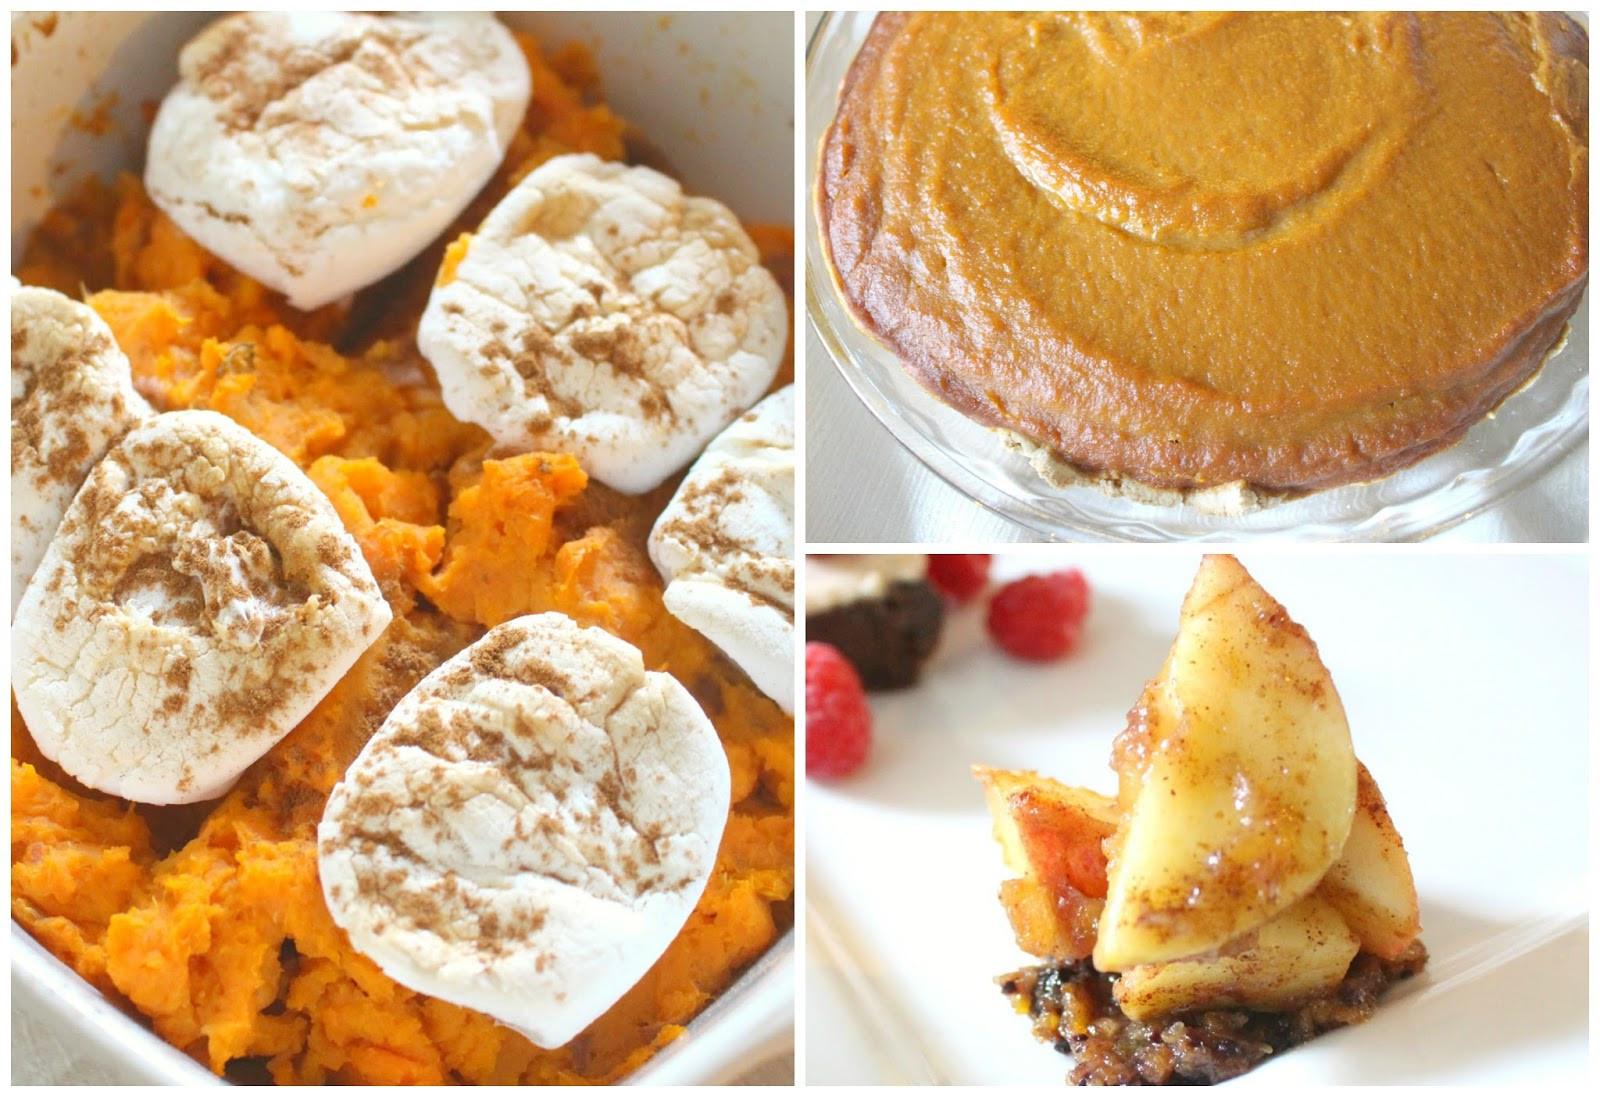 Vegan Gluten Free Thanksgiving  Beautyybychloe Vegan & Gluten free Thanksgiving Recipes